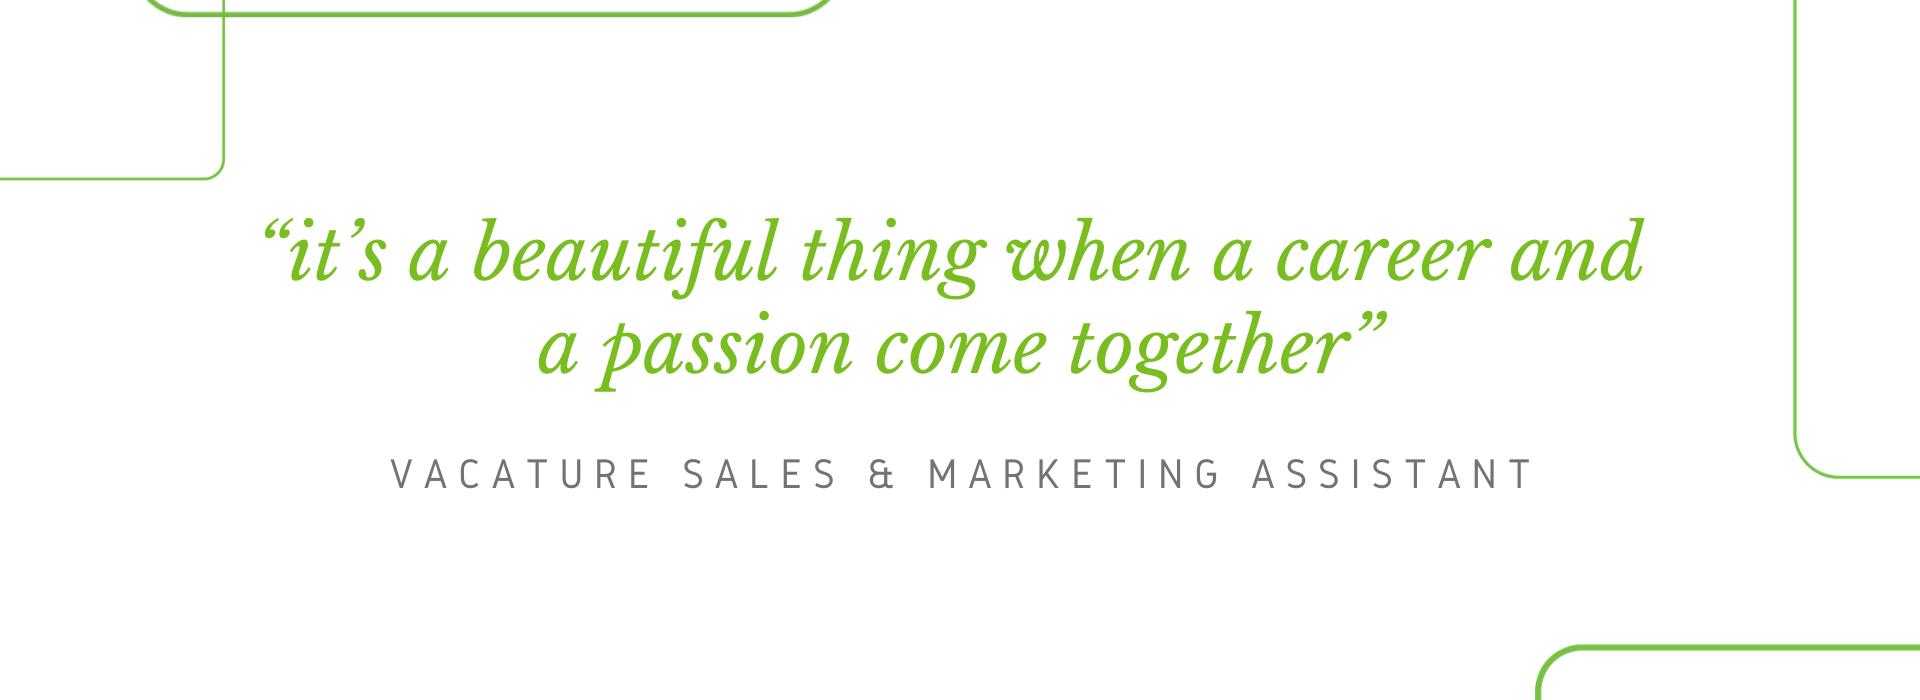 Vacature Sales & Marketing Assistant